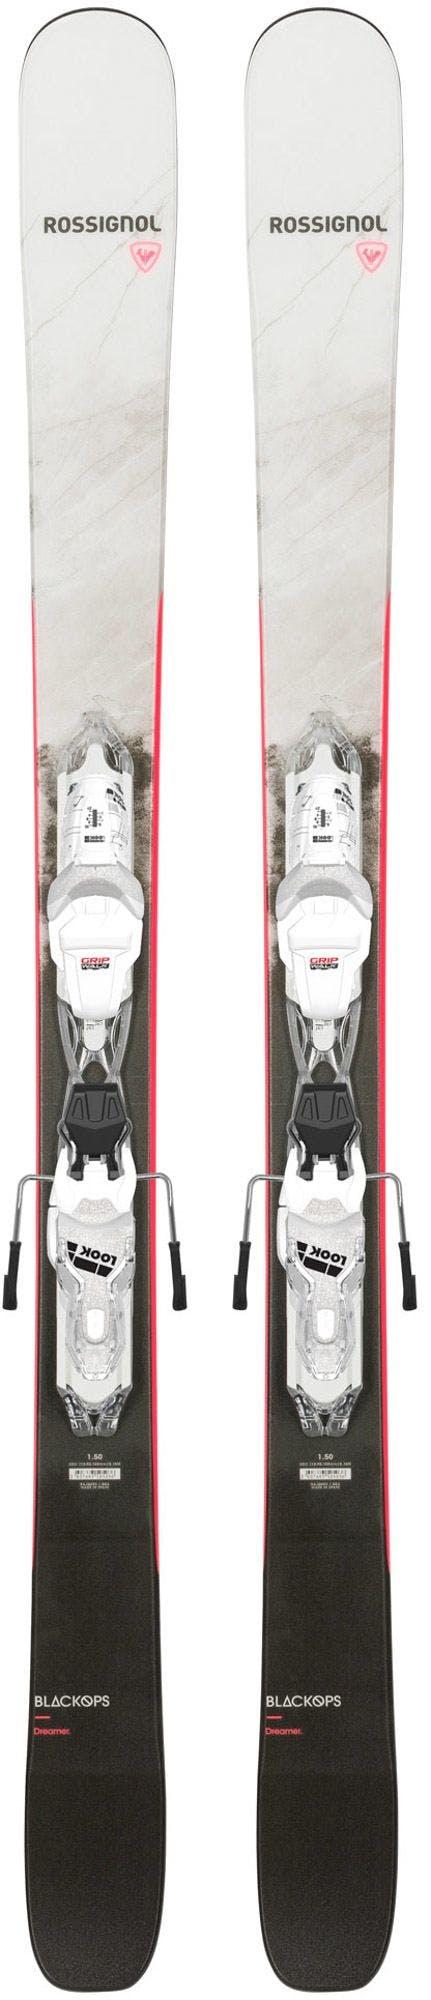 Rossignol Black Ops Dreamer Women's Skis + Xpress 10 Gw Bindings · 2021